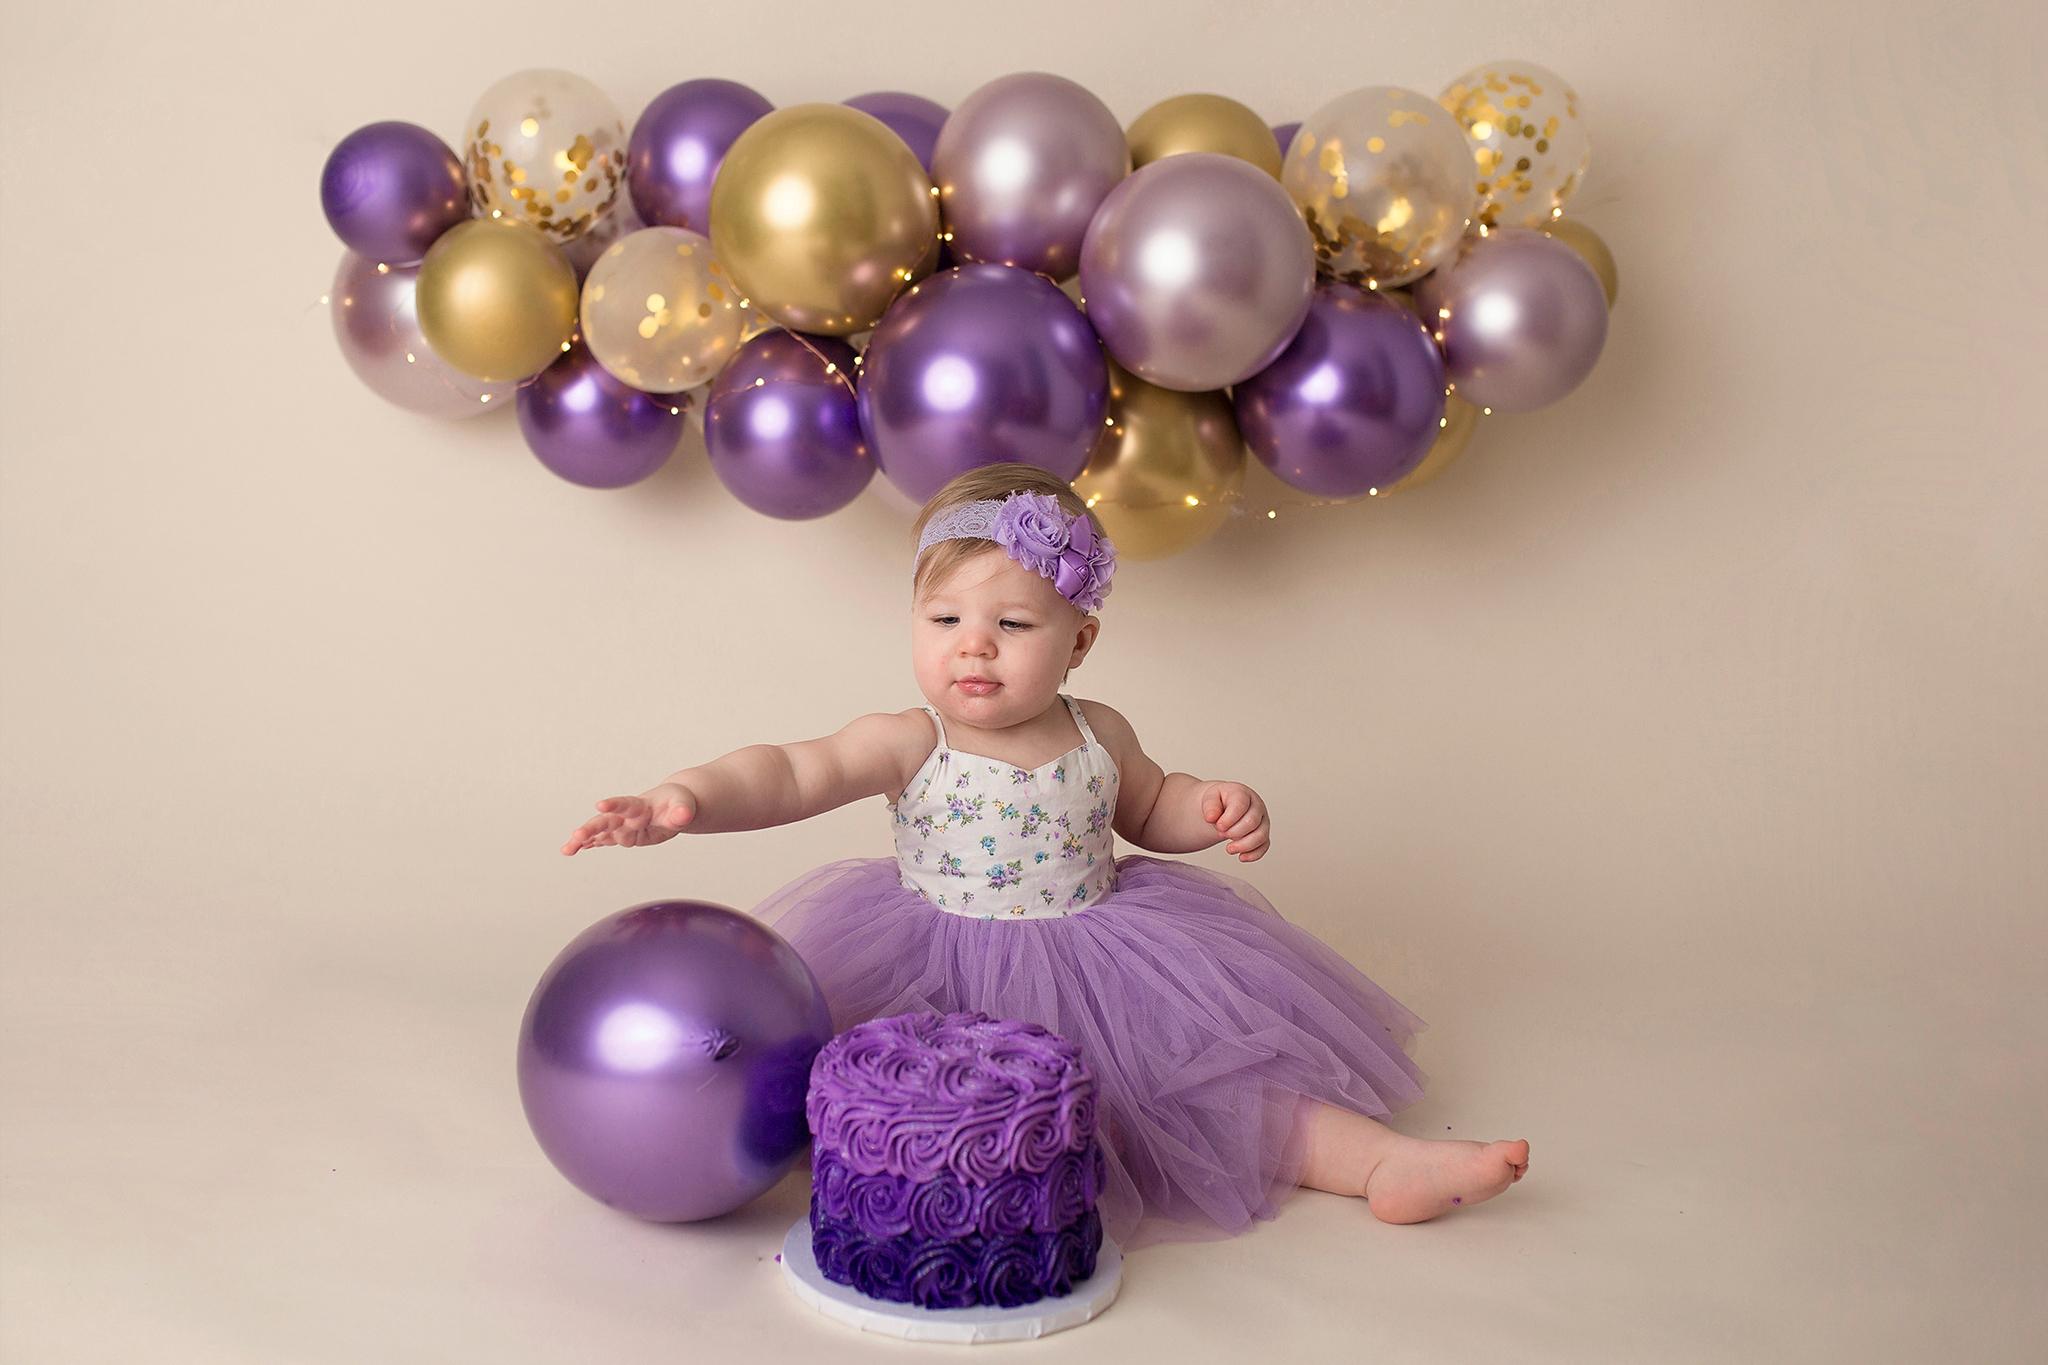 cake smash photographer baby portraits 2021